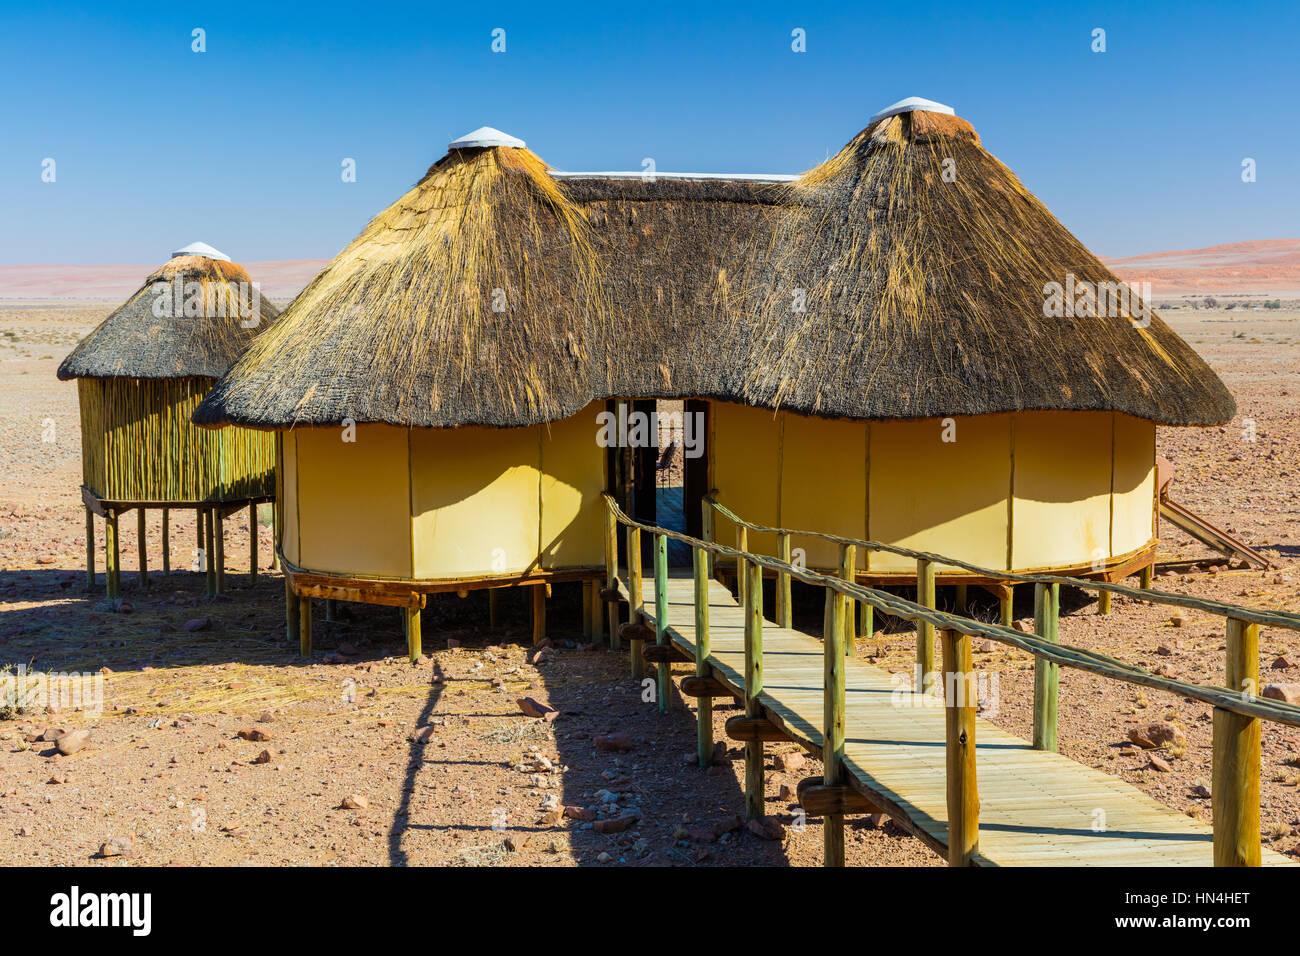 Sossus Dune Lodge è accoccolato contro le basse montagne in Namib-Naukluft National Park in Namibia. Immagini Stock